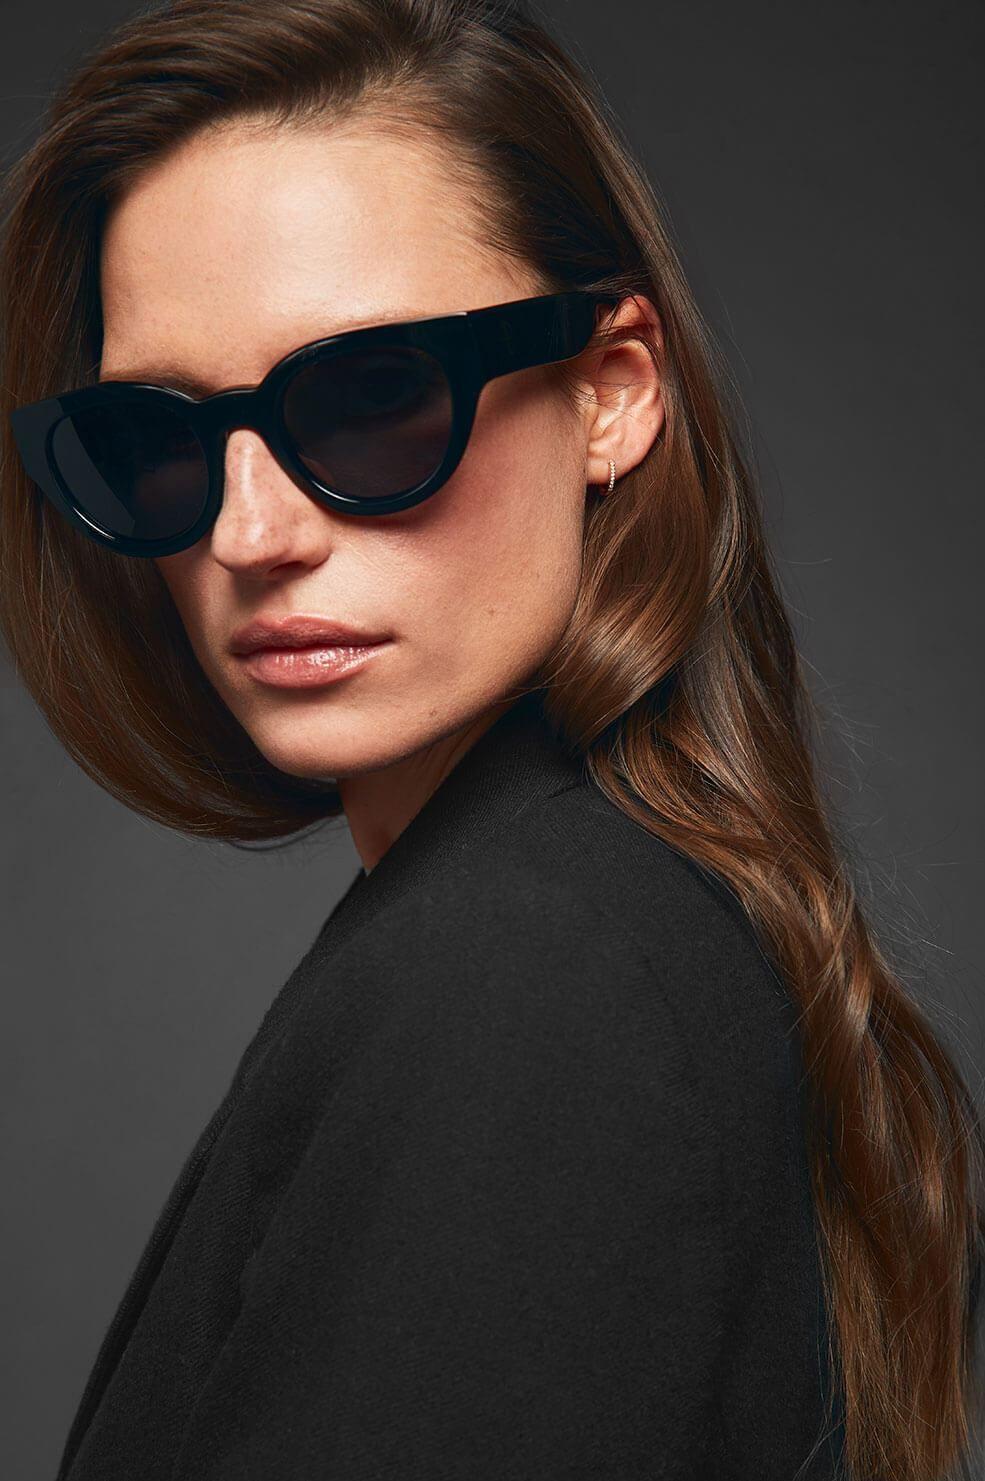 97a590e6ab8 ANINE BING Trousdale Sunglasses - Black